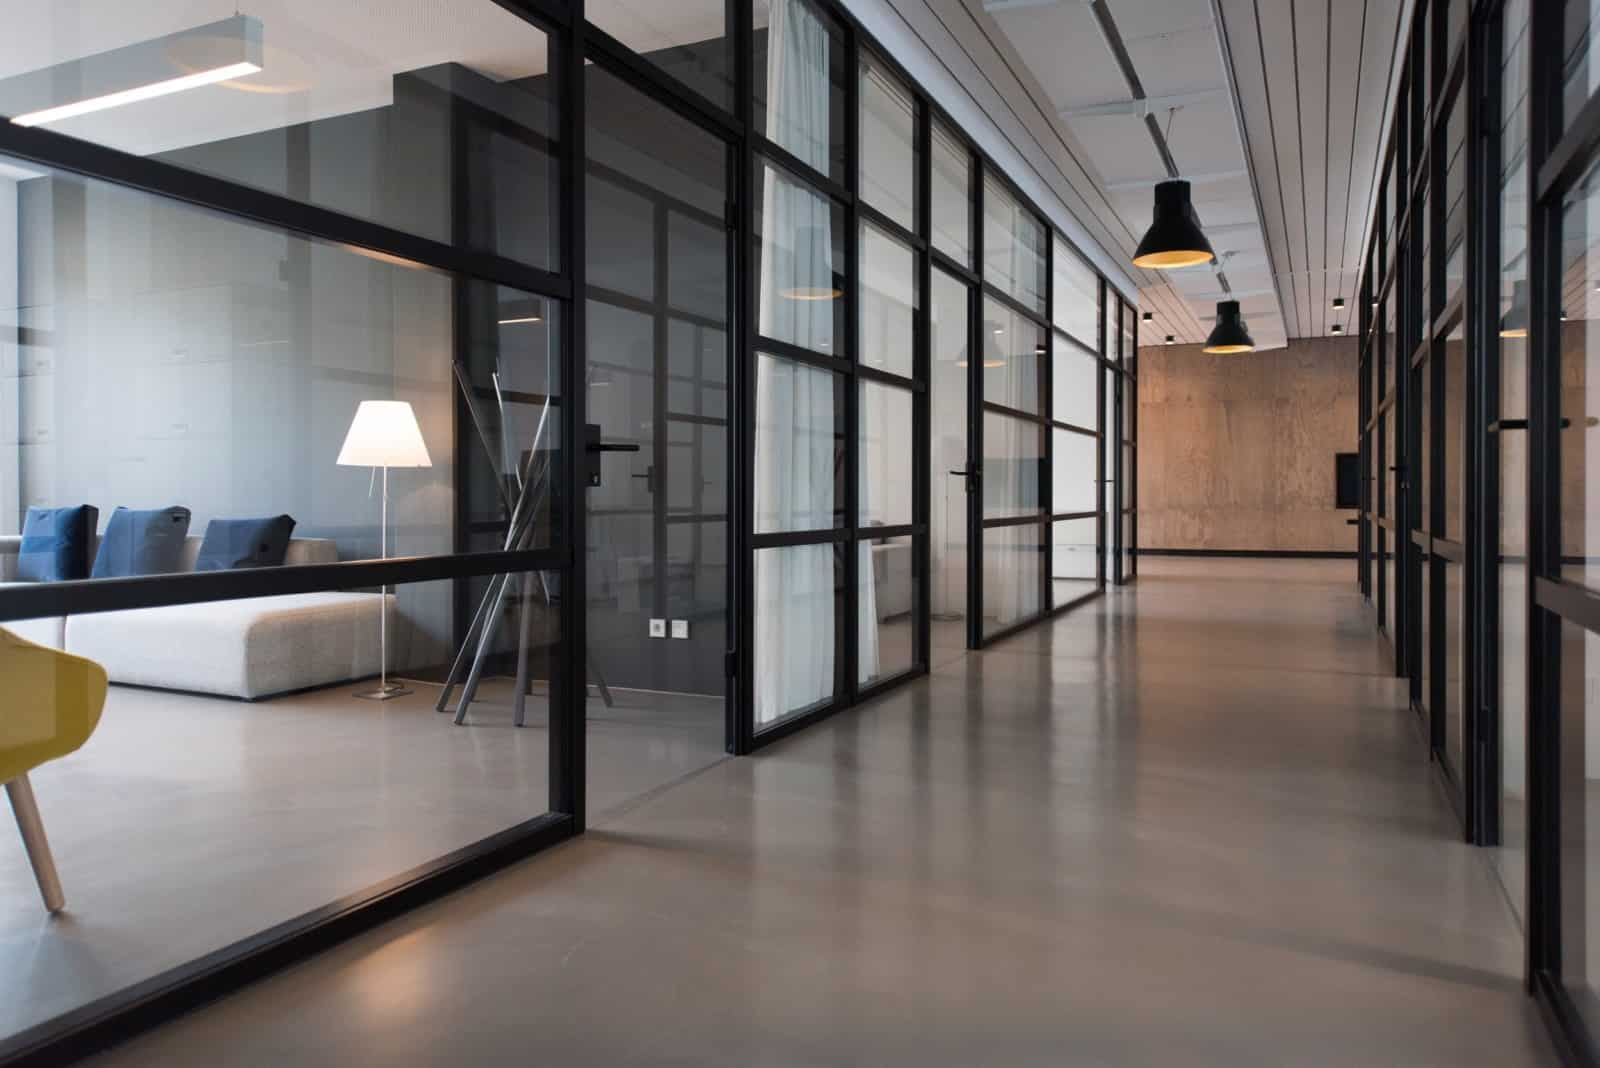 Corridor of a modern office building